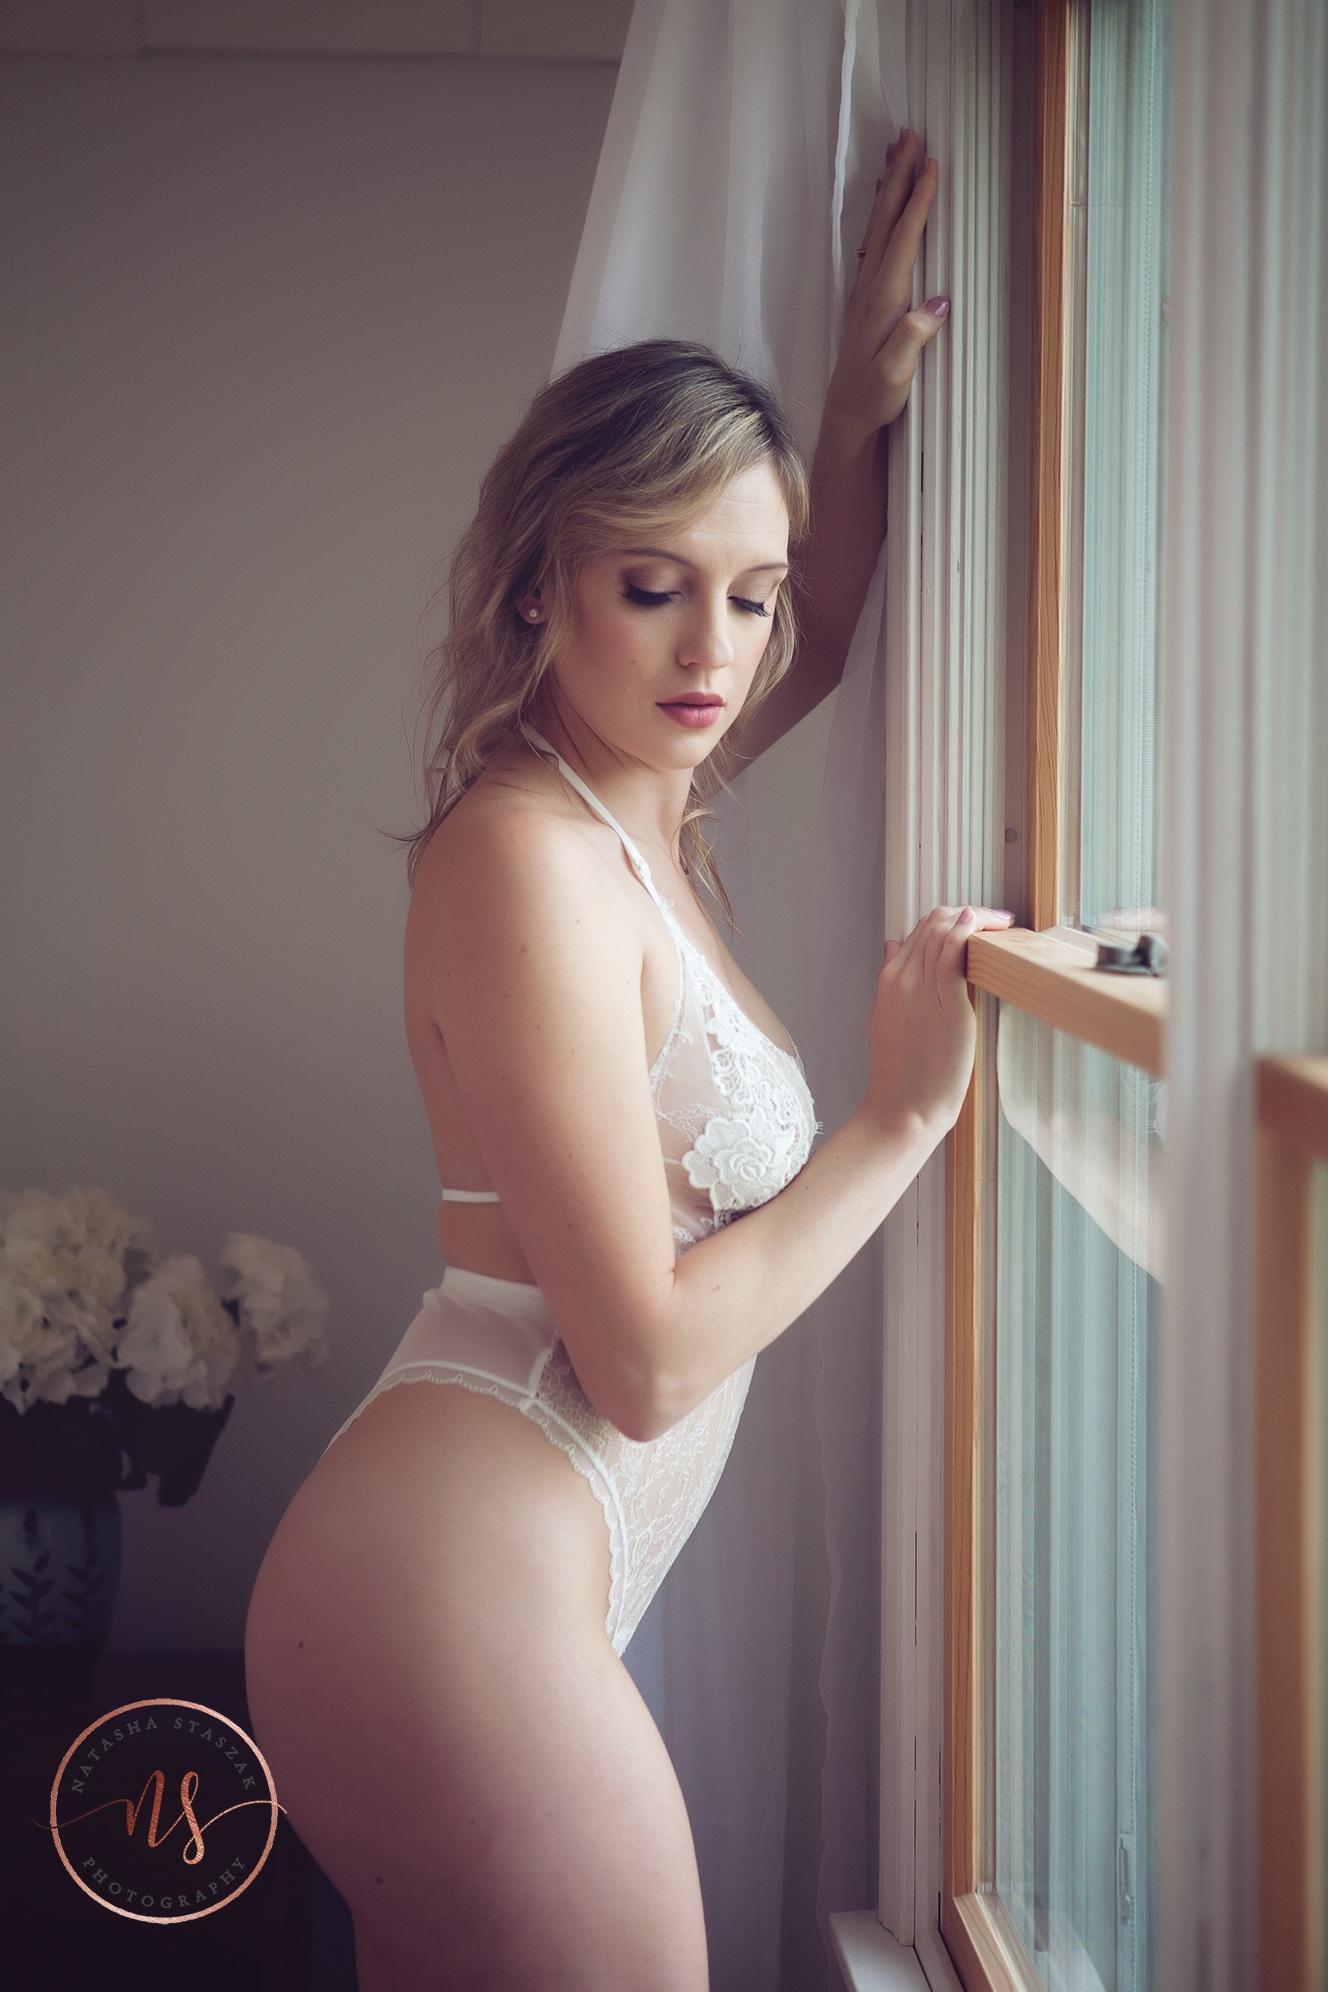 Boudoir Buffalo Photo shoot - white lingerie of woman standing near window.